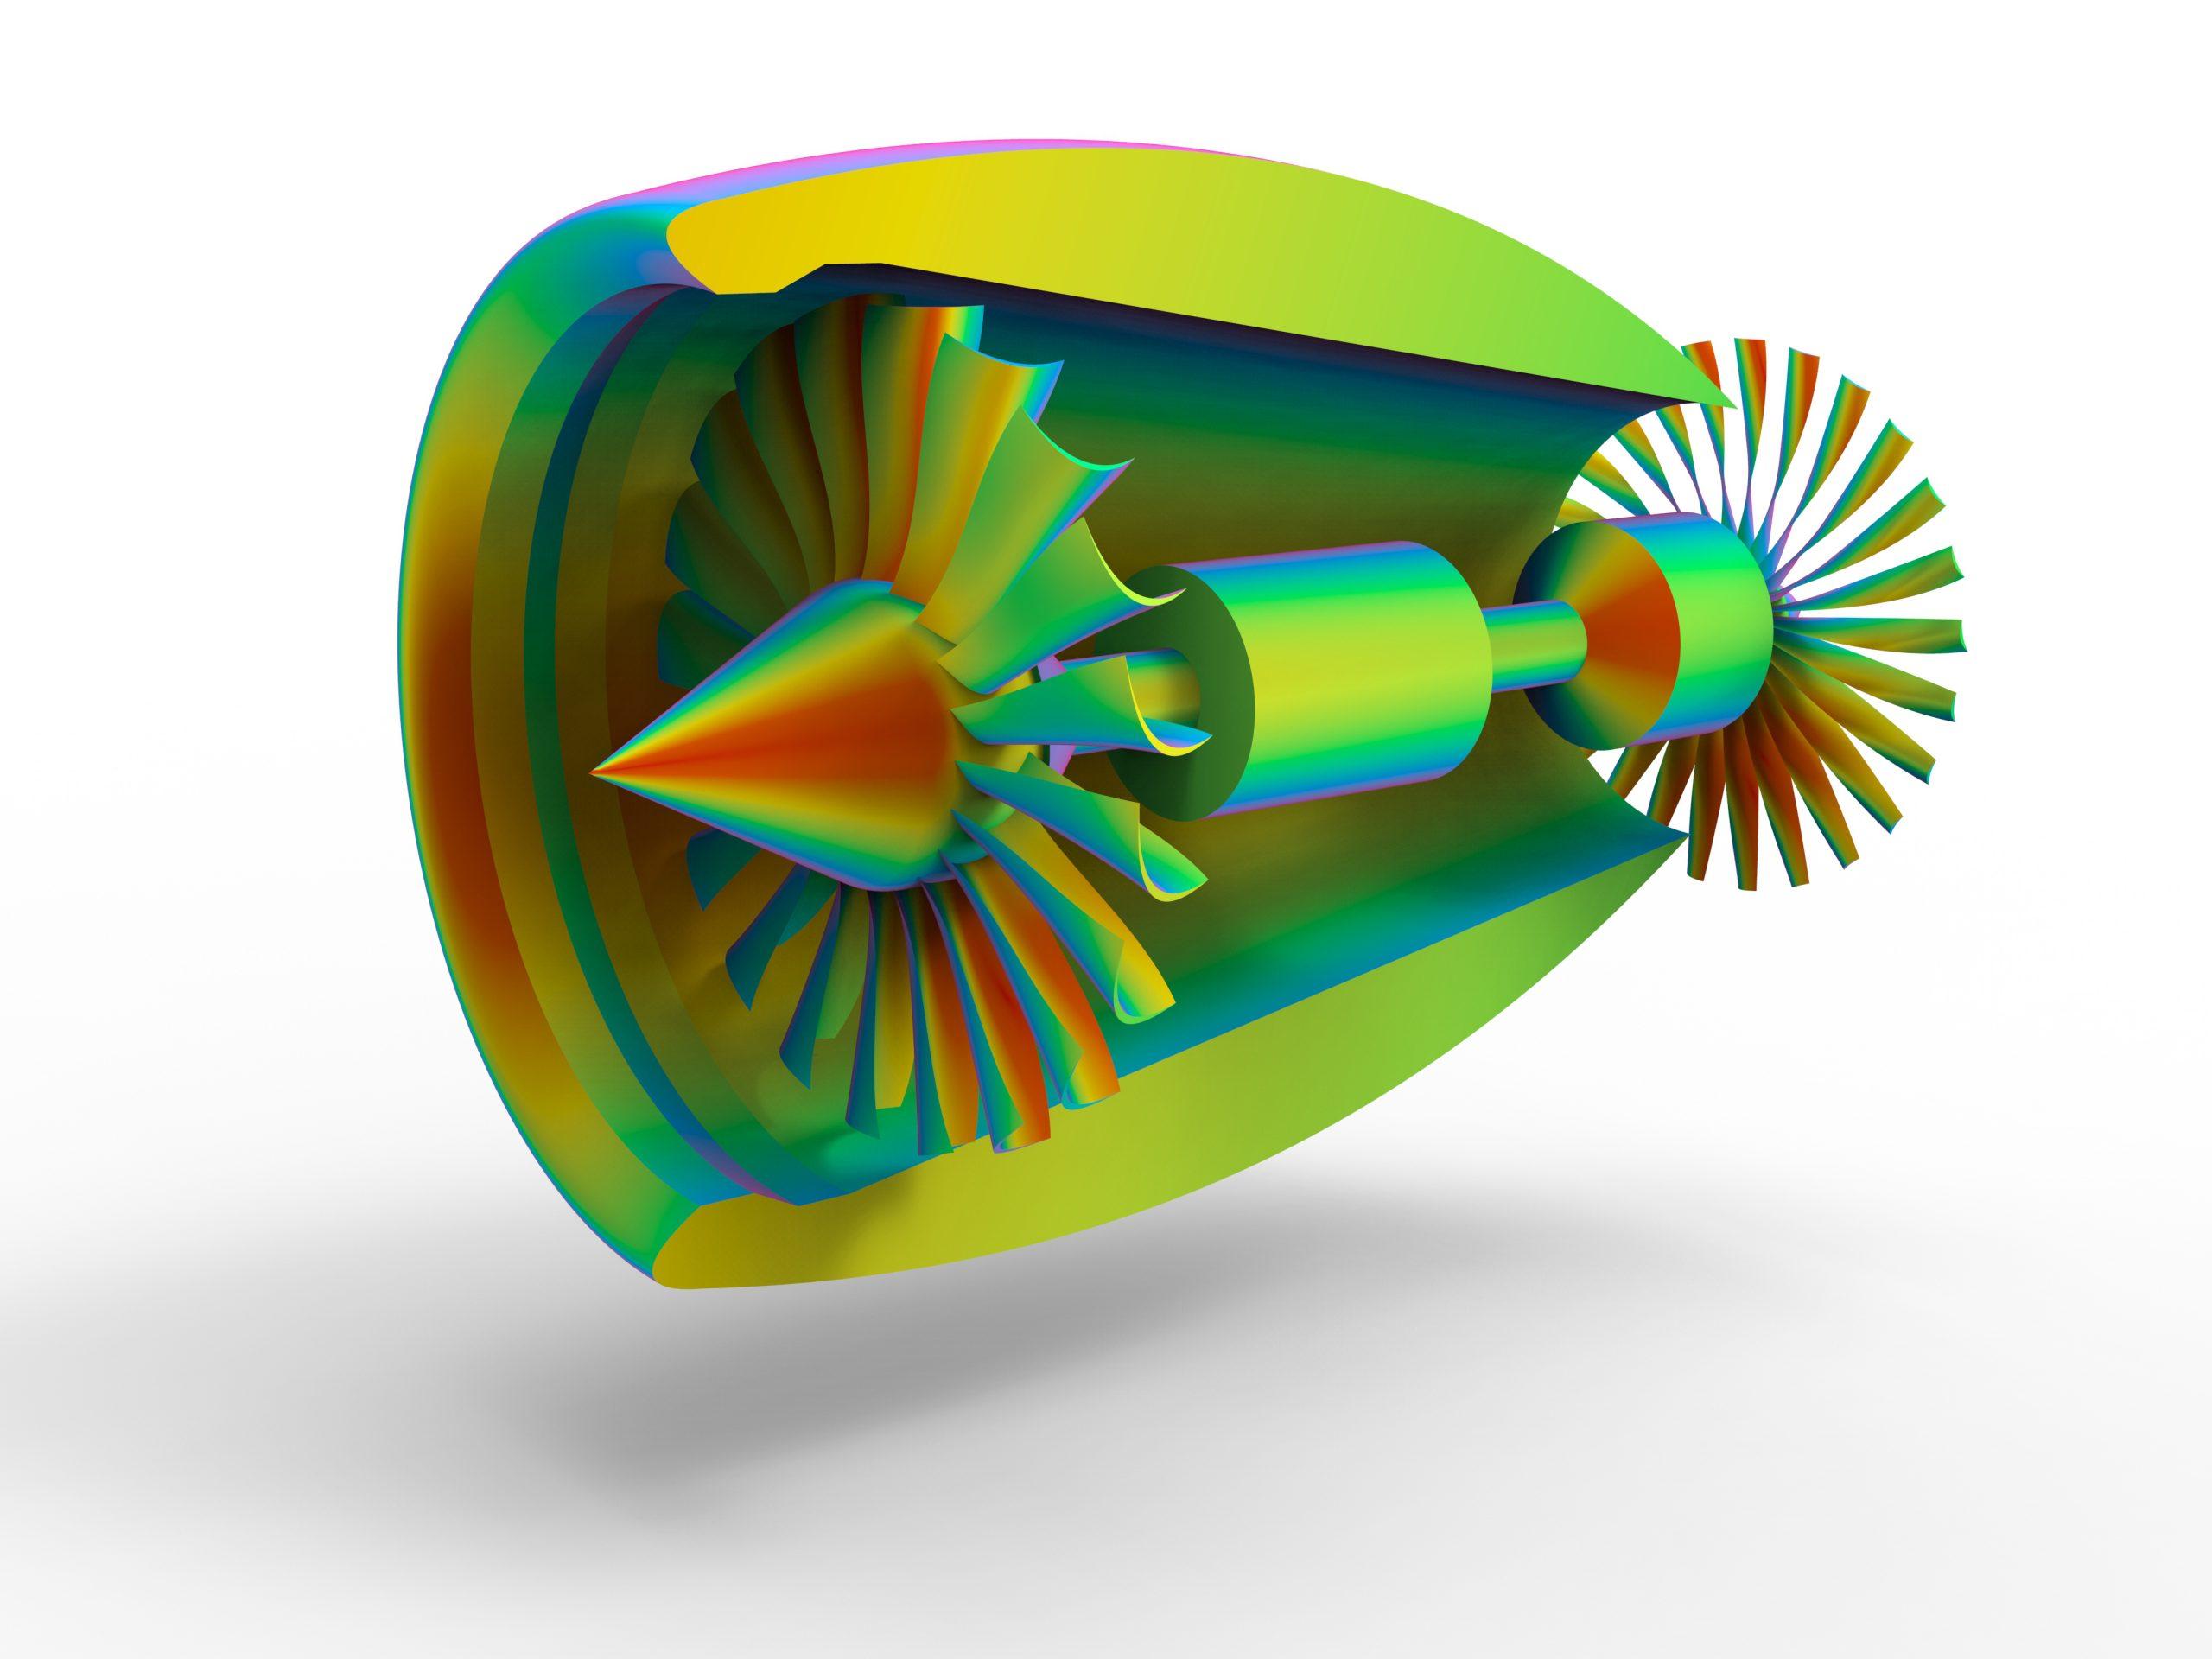 finite image analysis of airplane engine